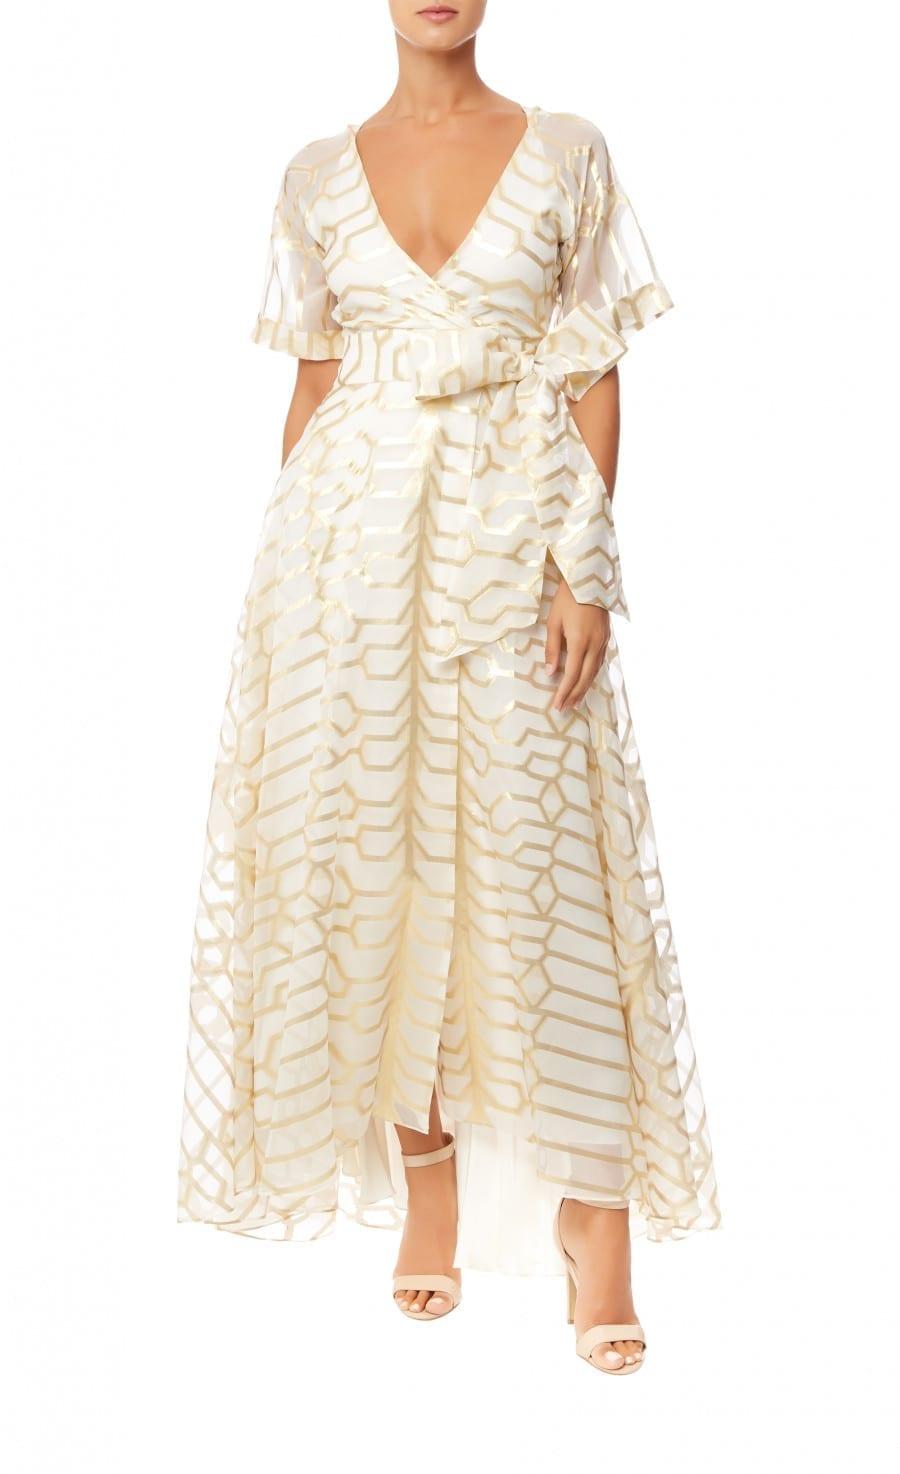 f62a7d8c7ef1e SHOP BY Dress - Page 32 of 78 - We Select Dresses